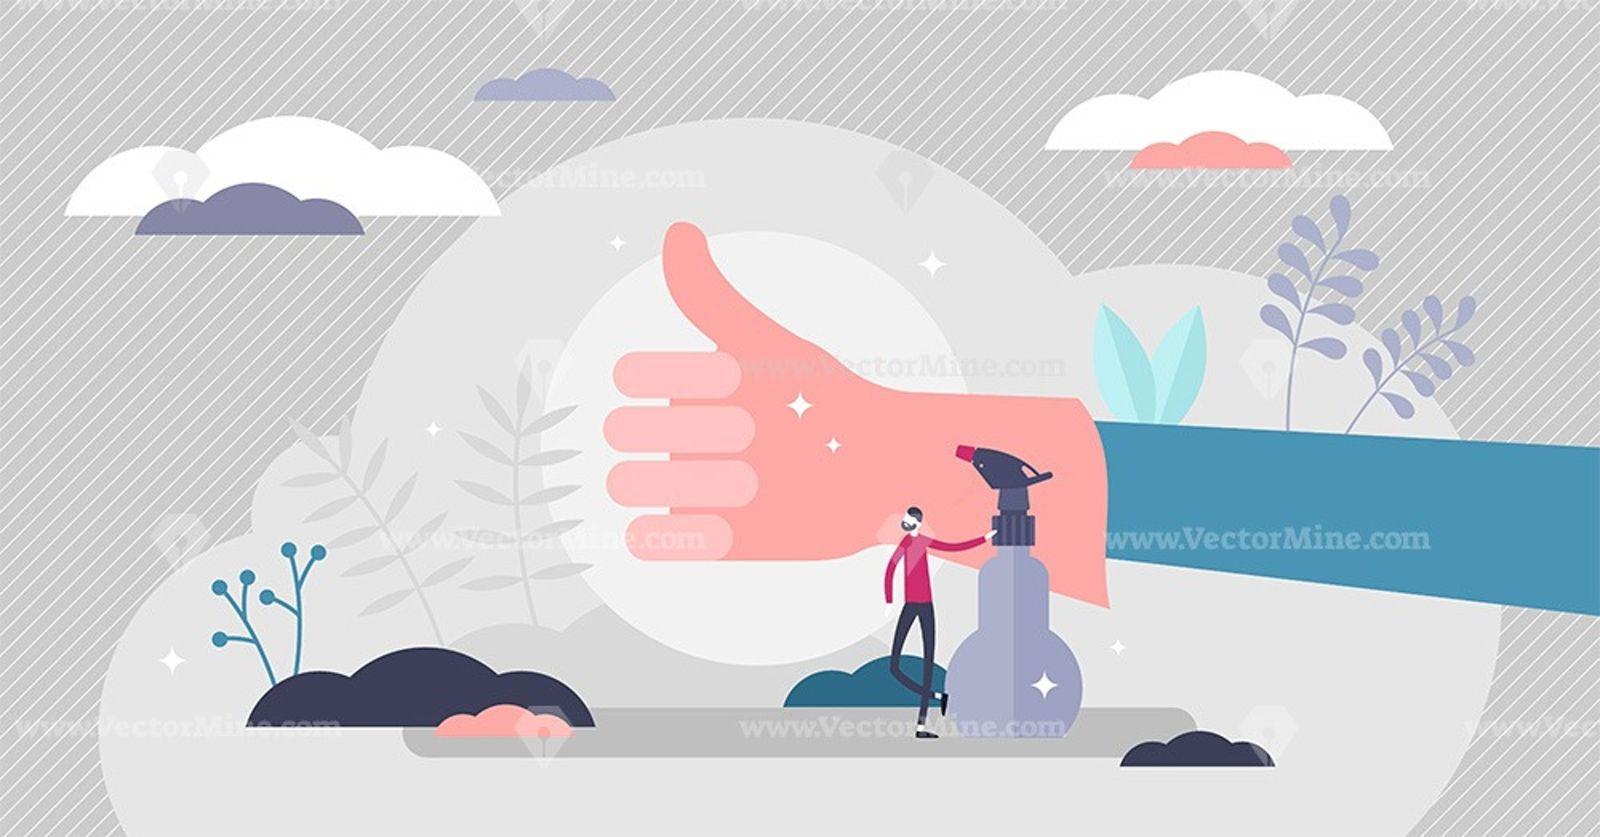 OK glove hand vector illustration in 2020 Vector